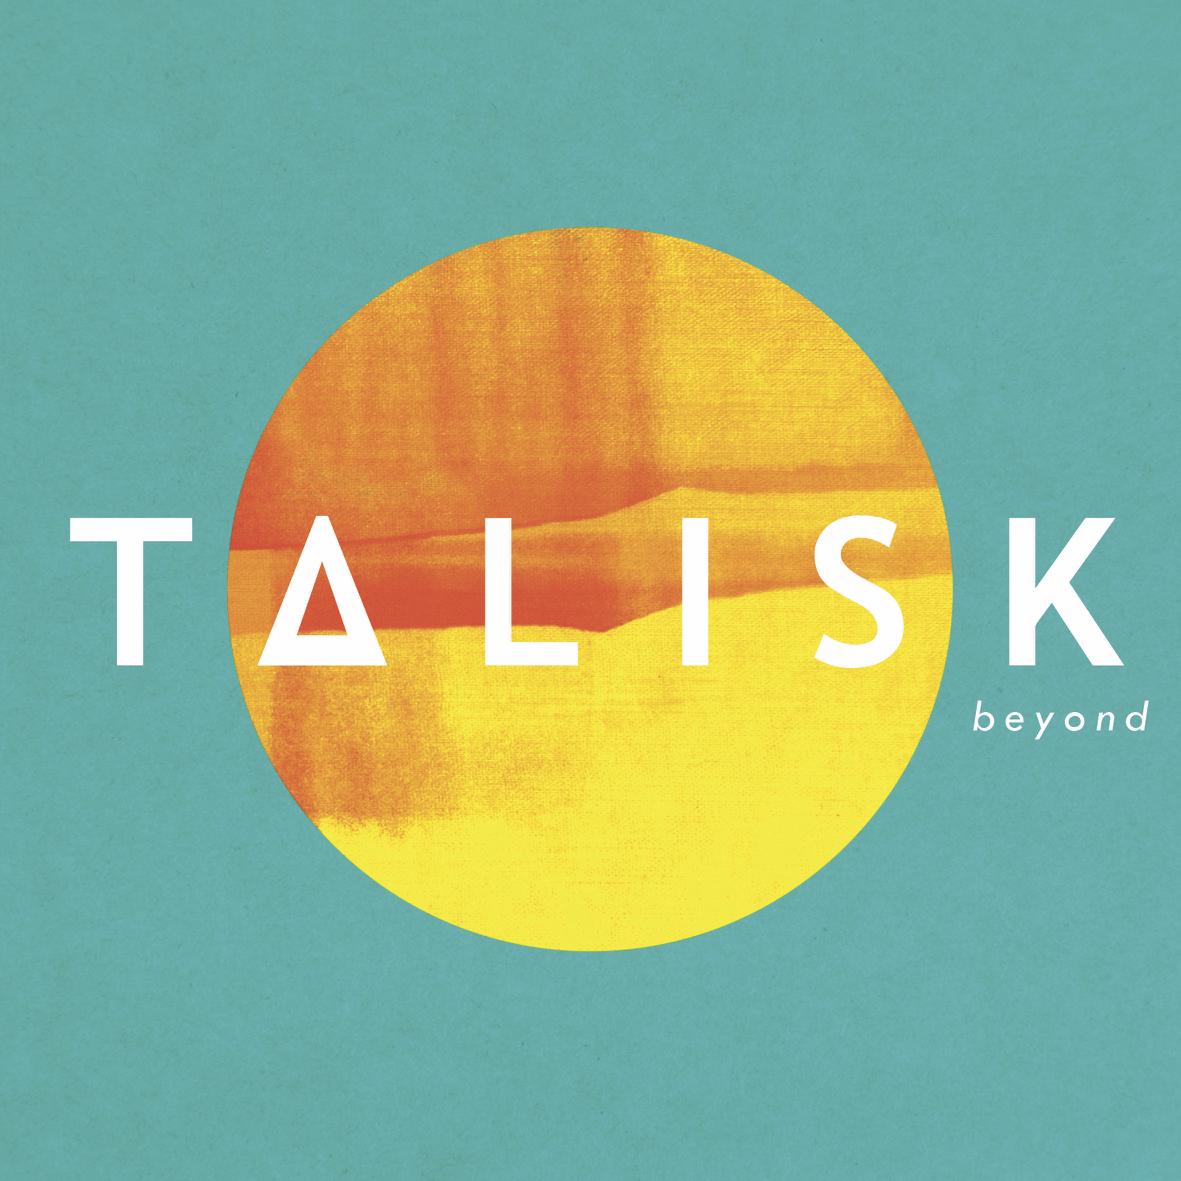 Talisk - Beyond